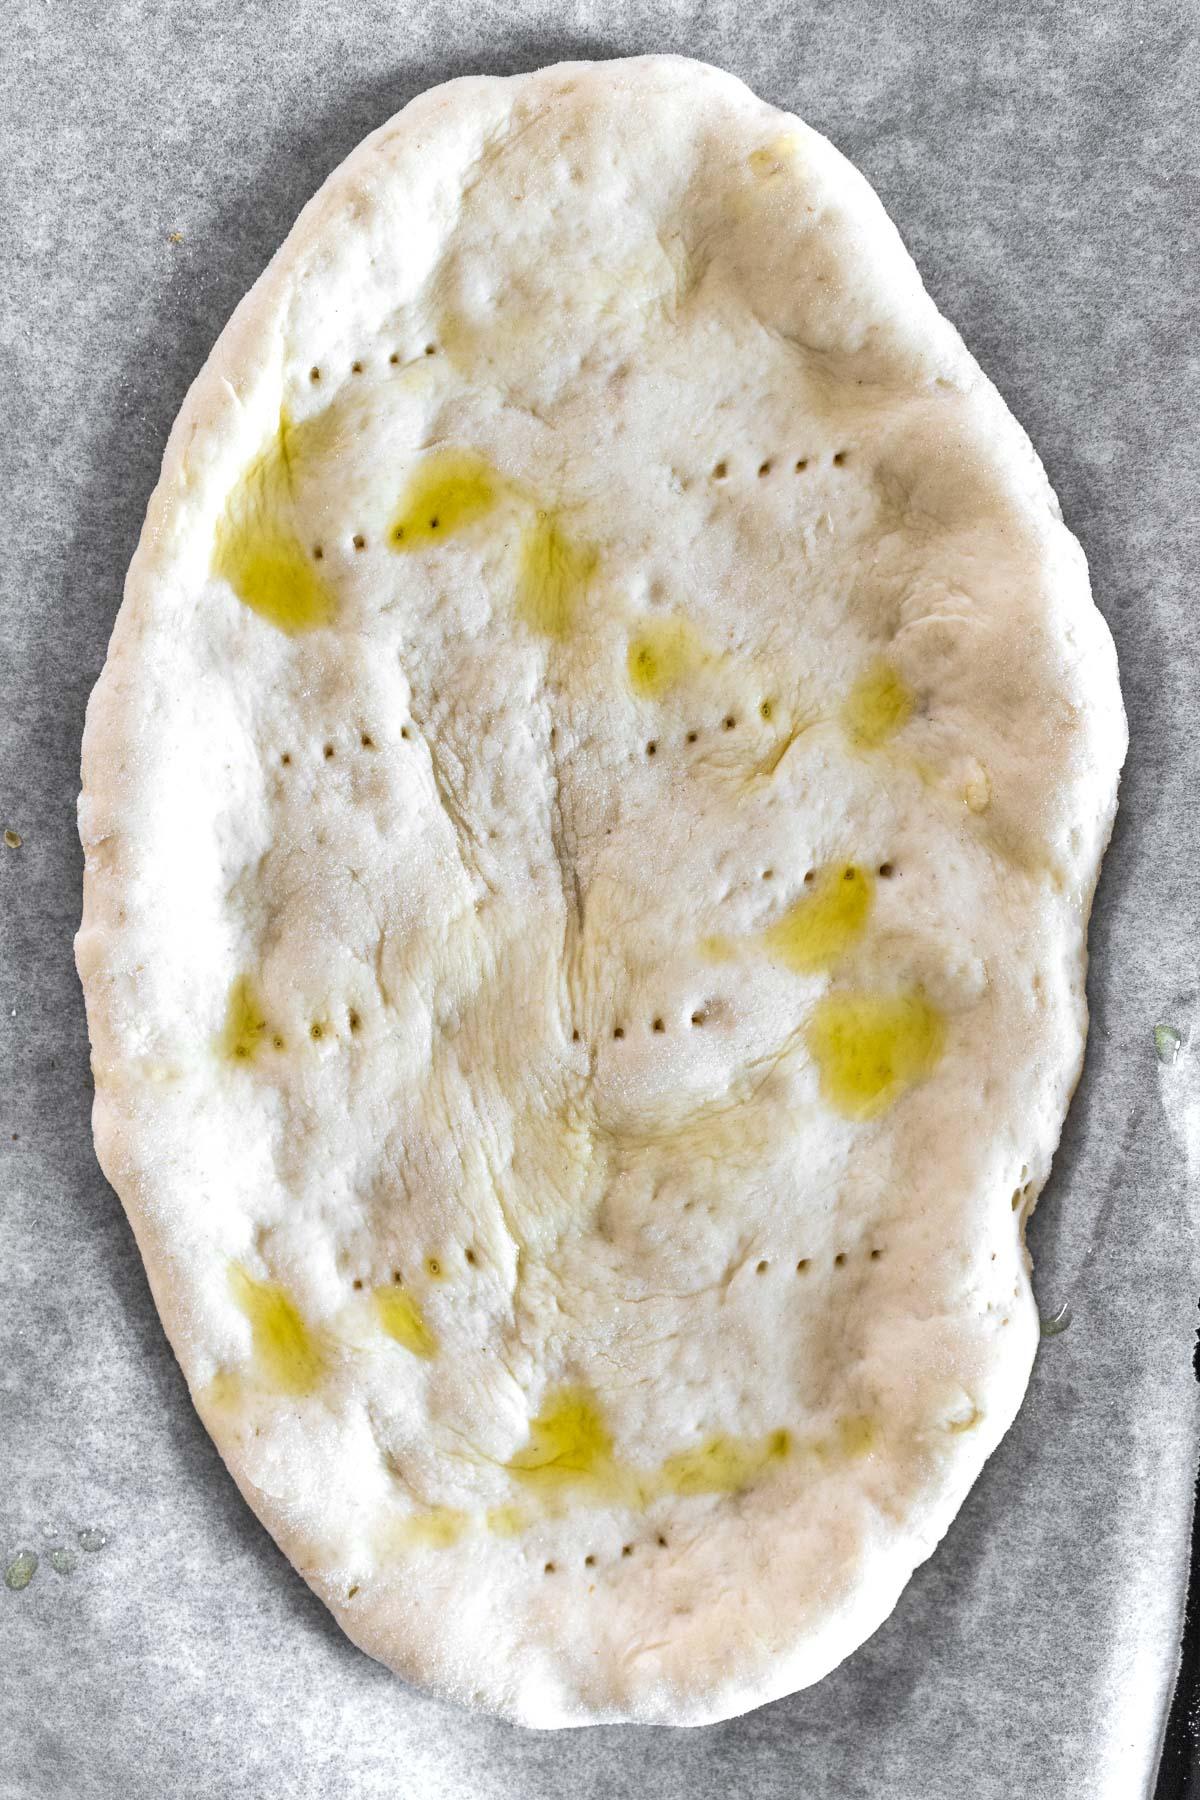 flatbread pizza ready to bake